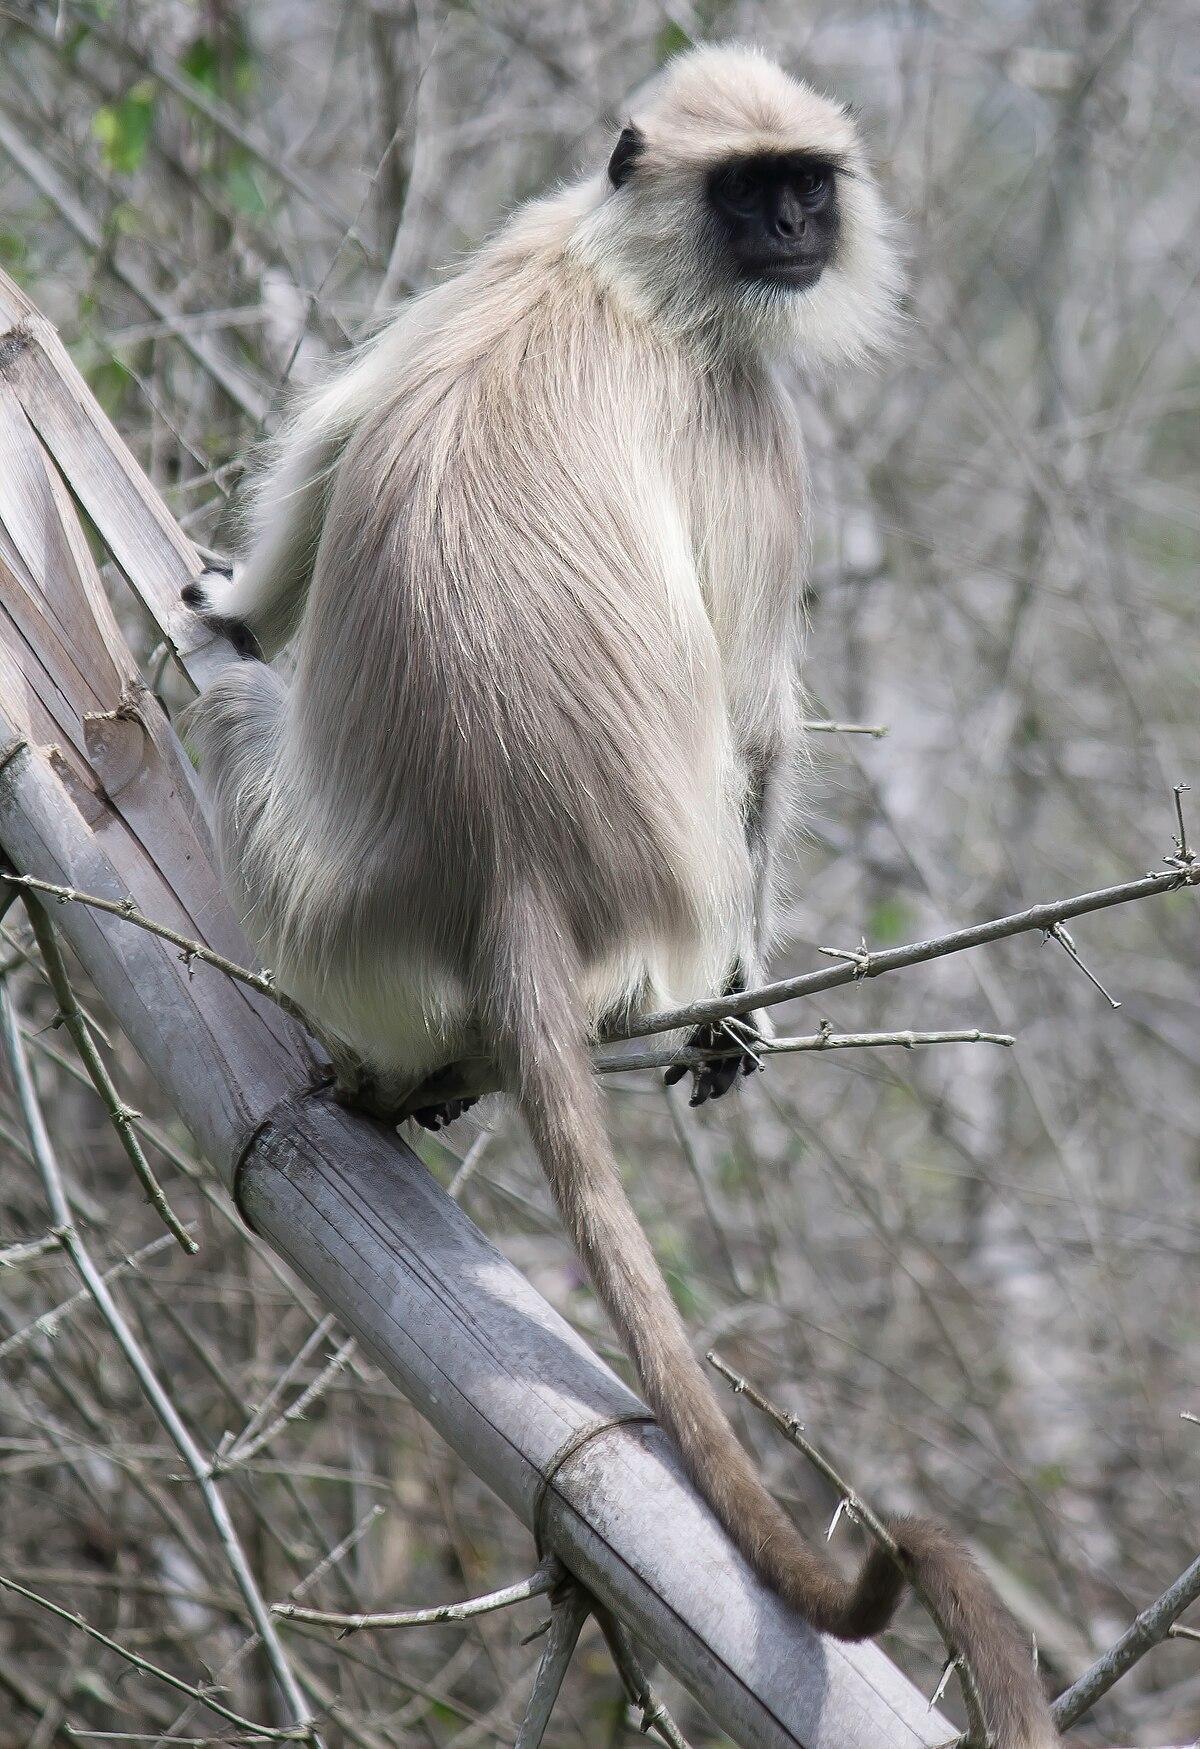 Gray langur - Wikipedia